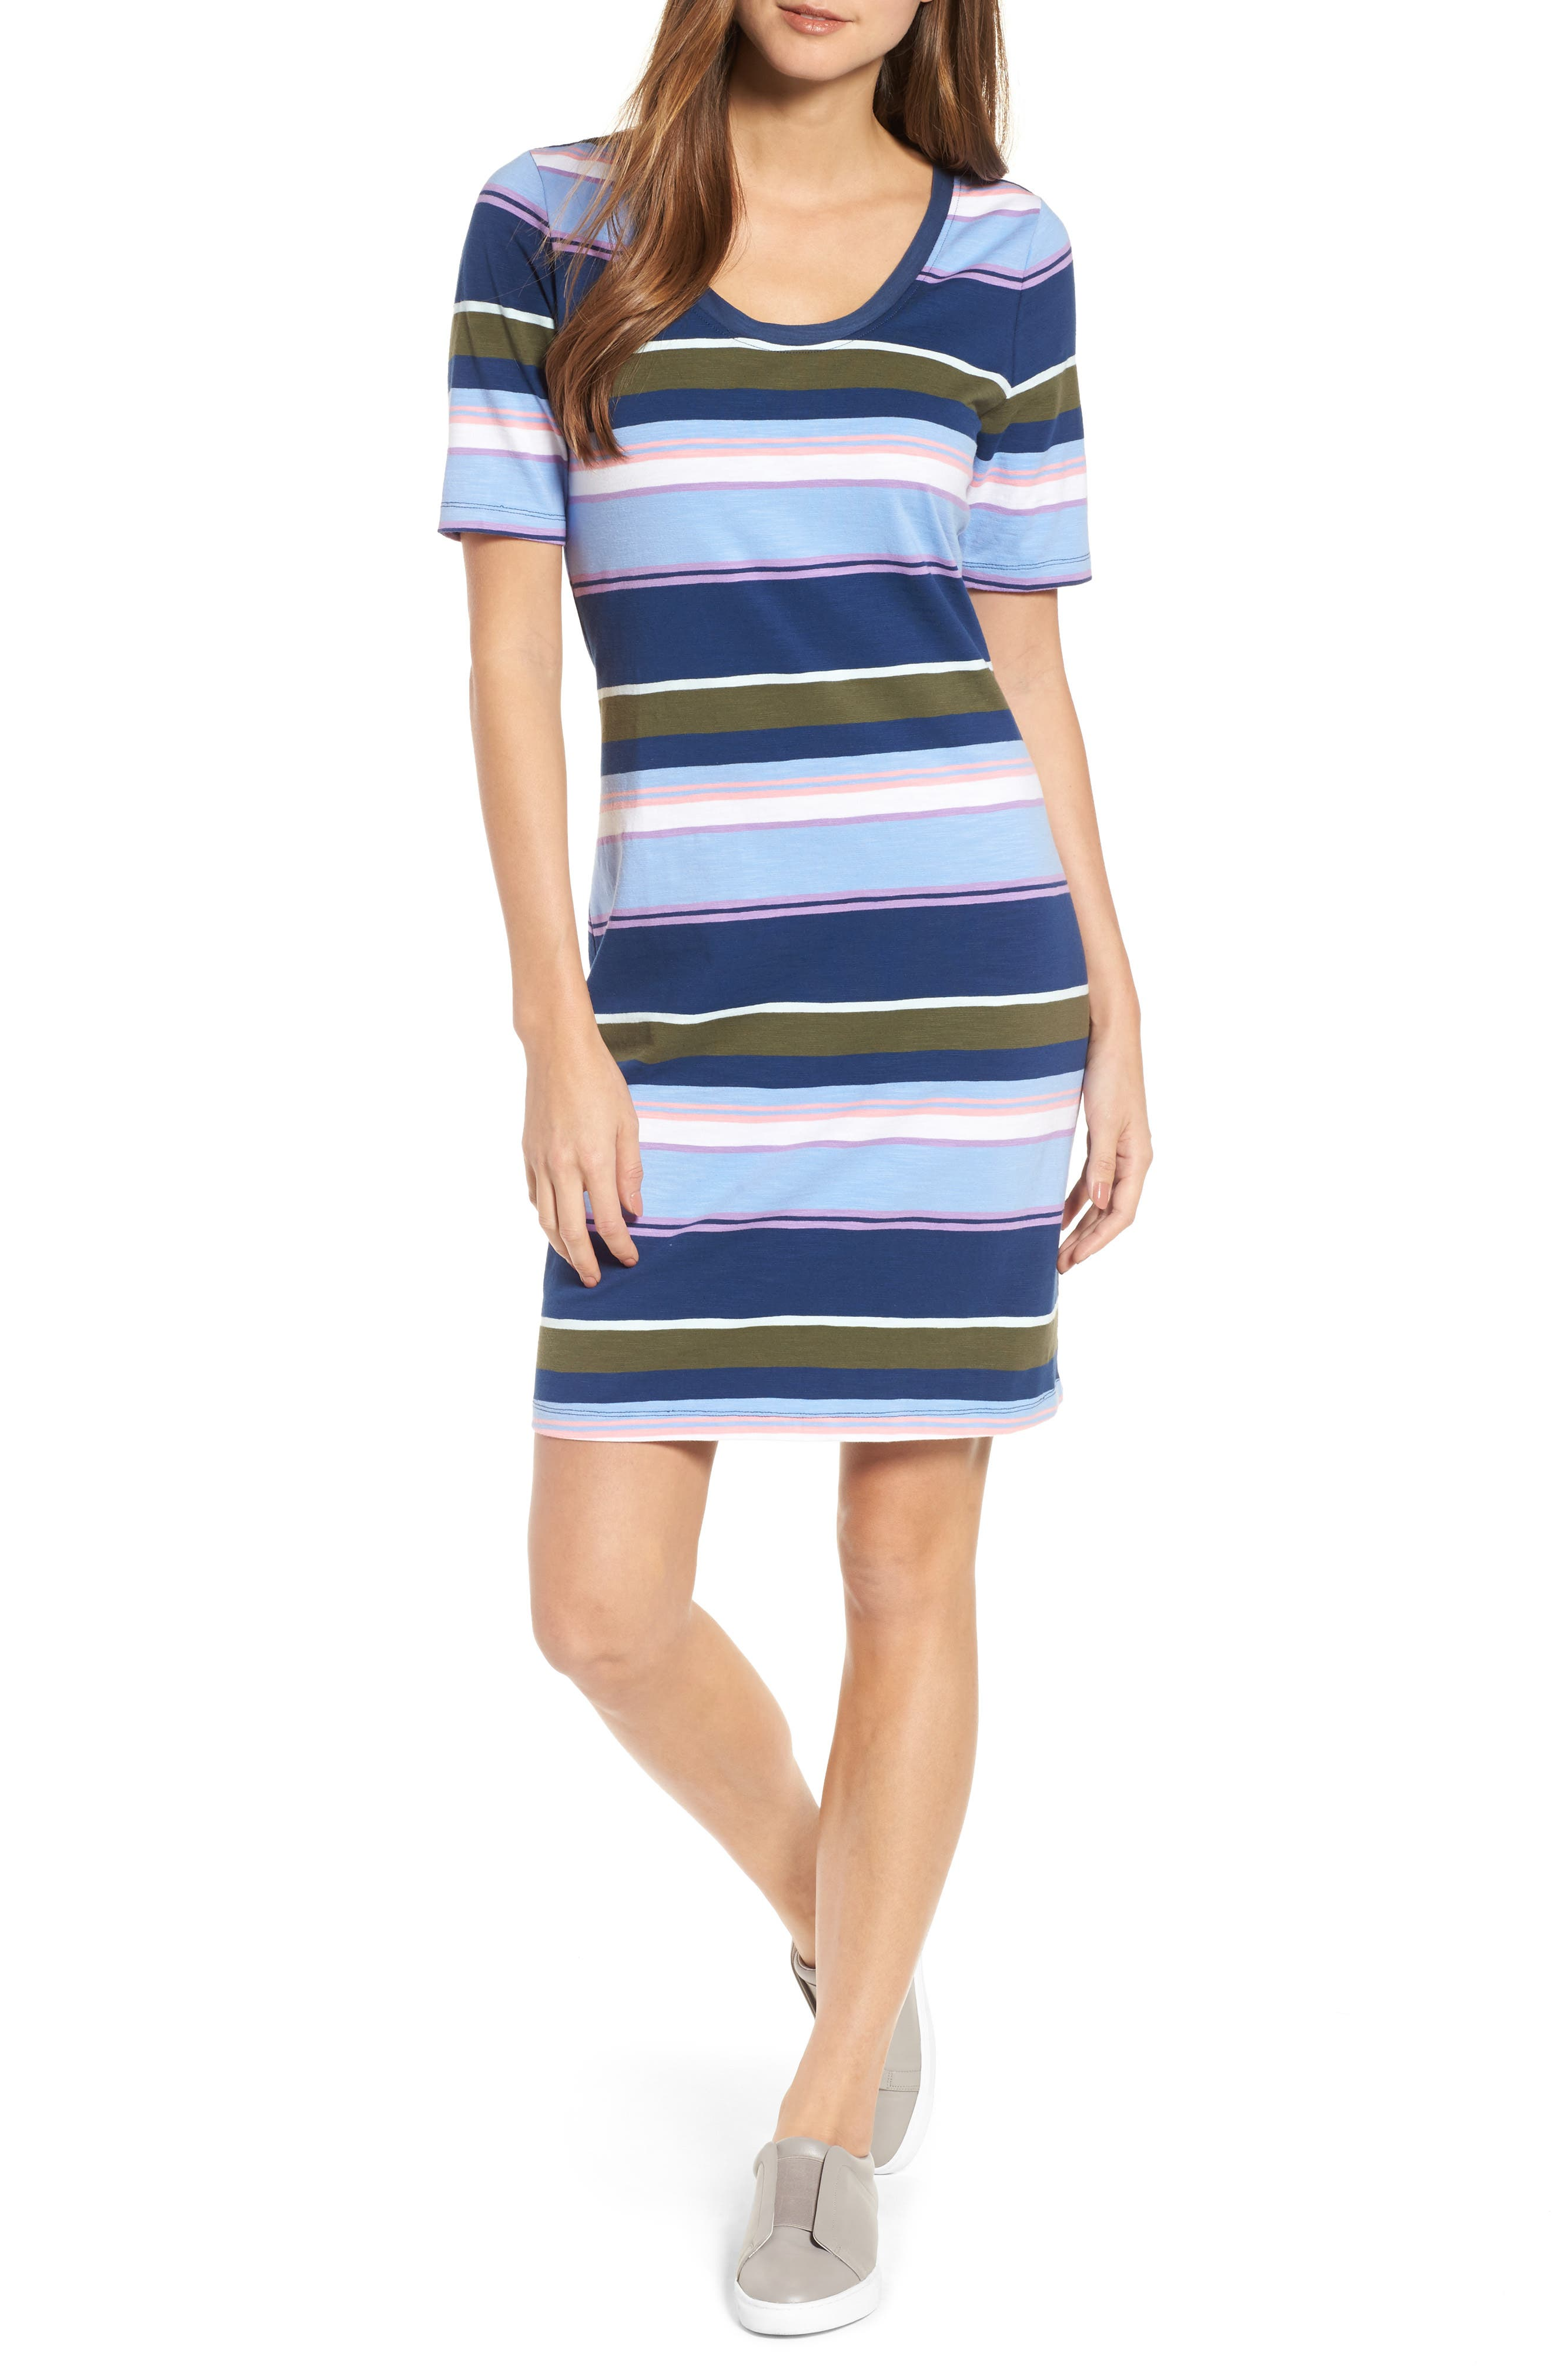 Alternate Image 1 Selected - Tommy Bahama Stripe Scoop Neck Dress